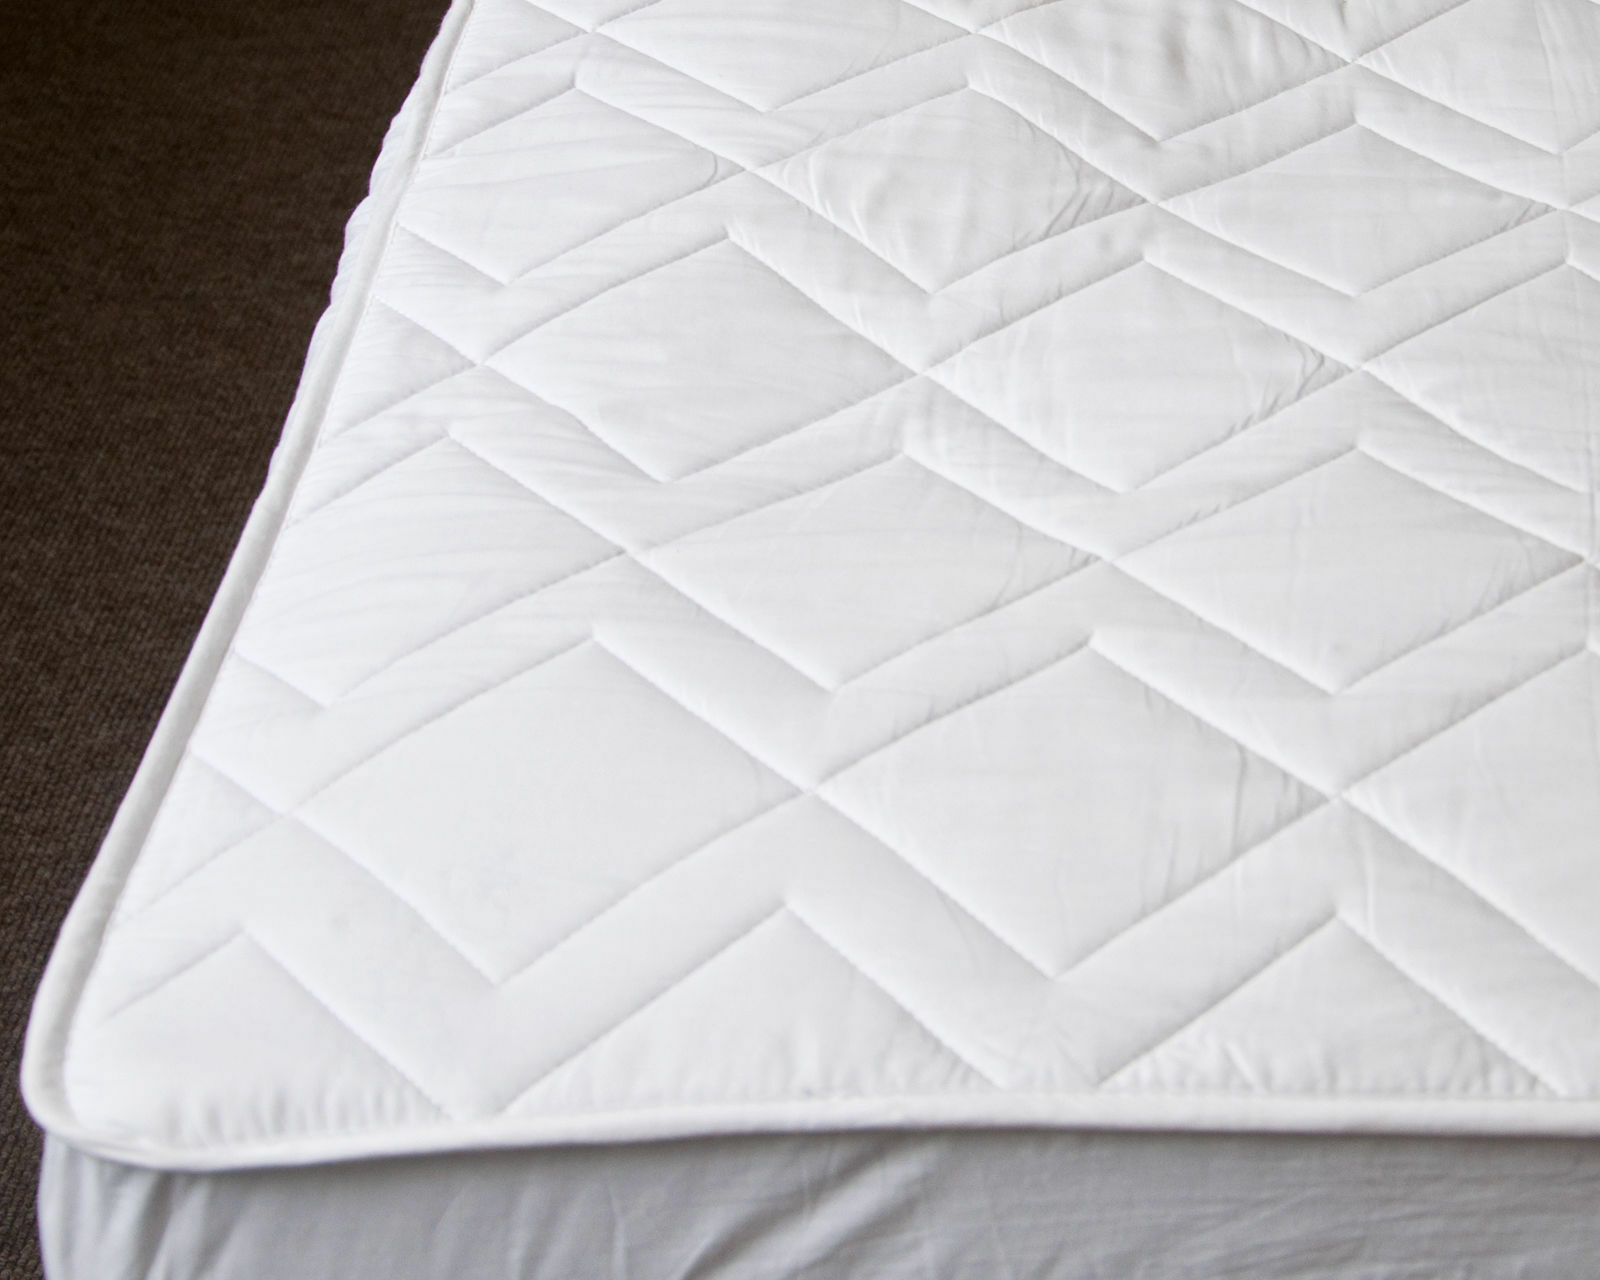 Premium Keep Cool Cotton Mattress Protector Fitted Sheet 3D Air relax All Größes